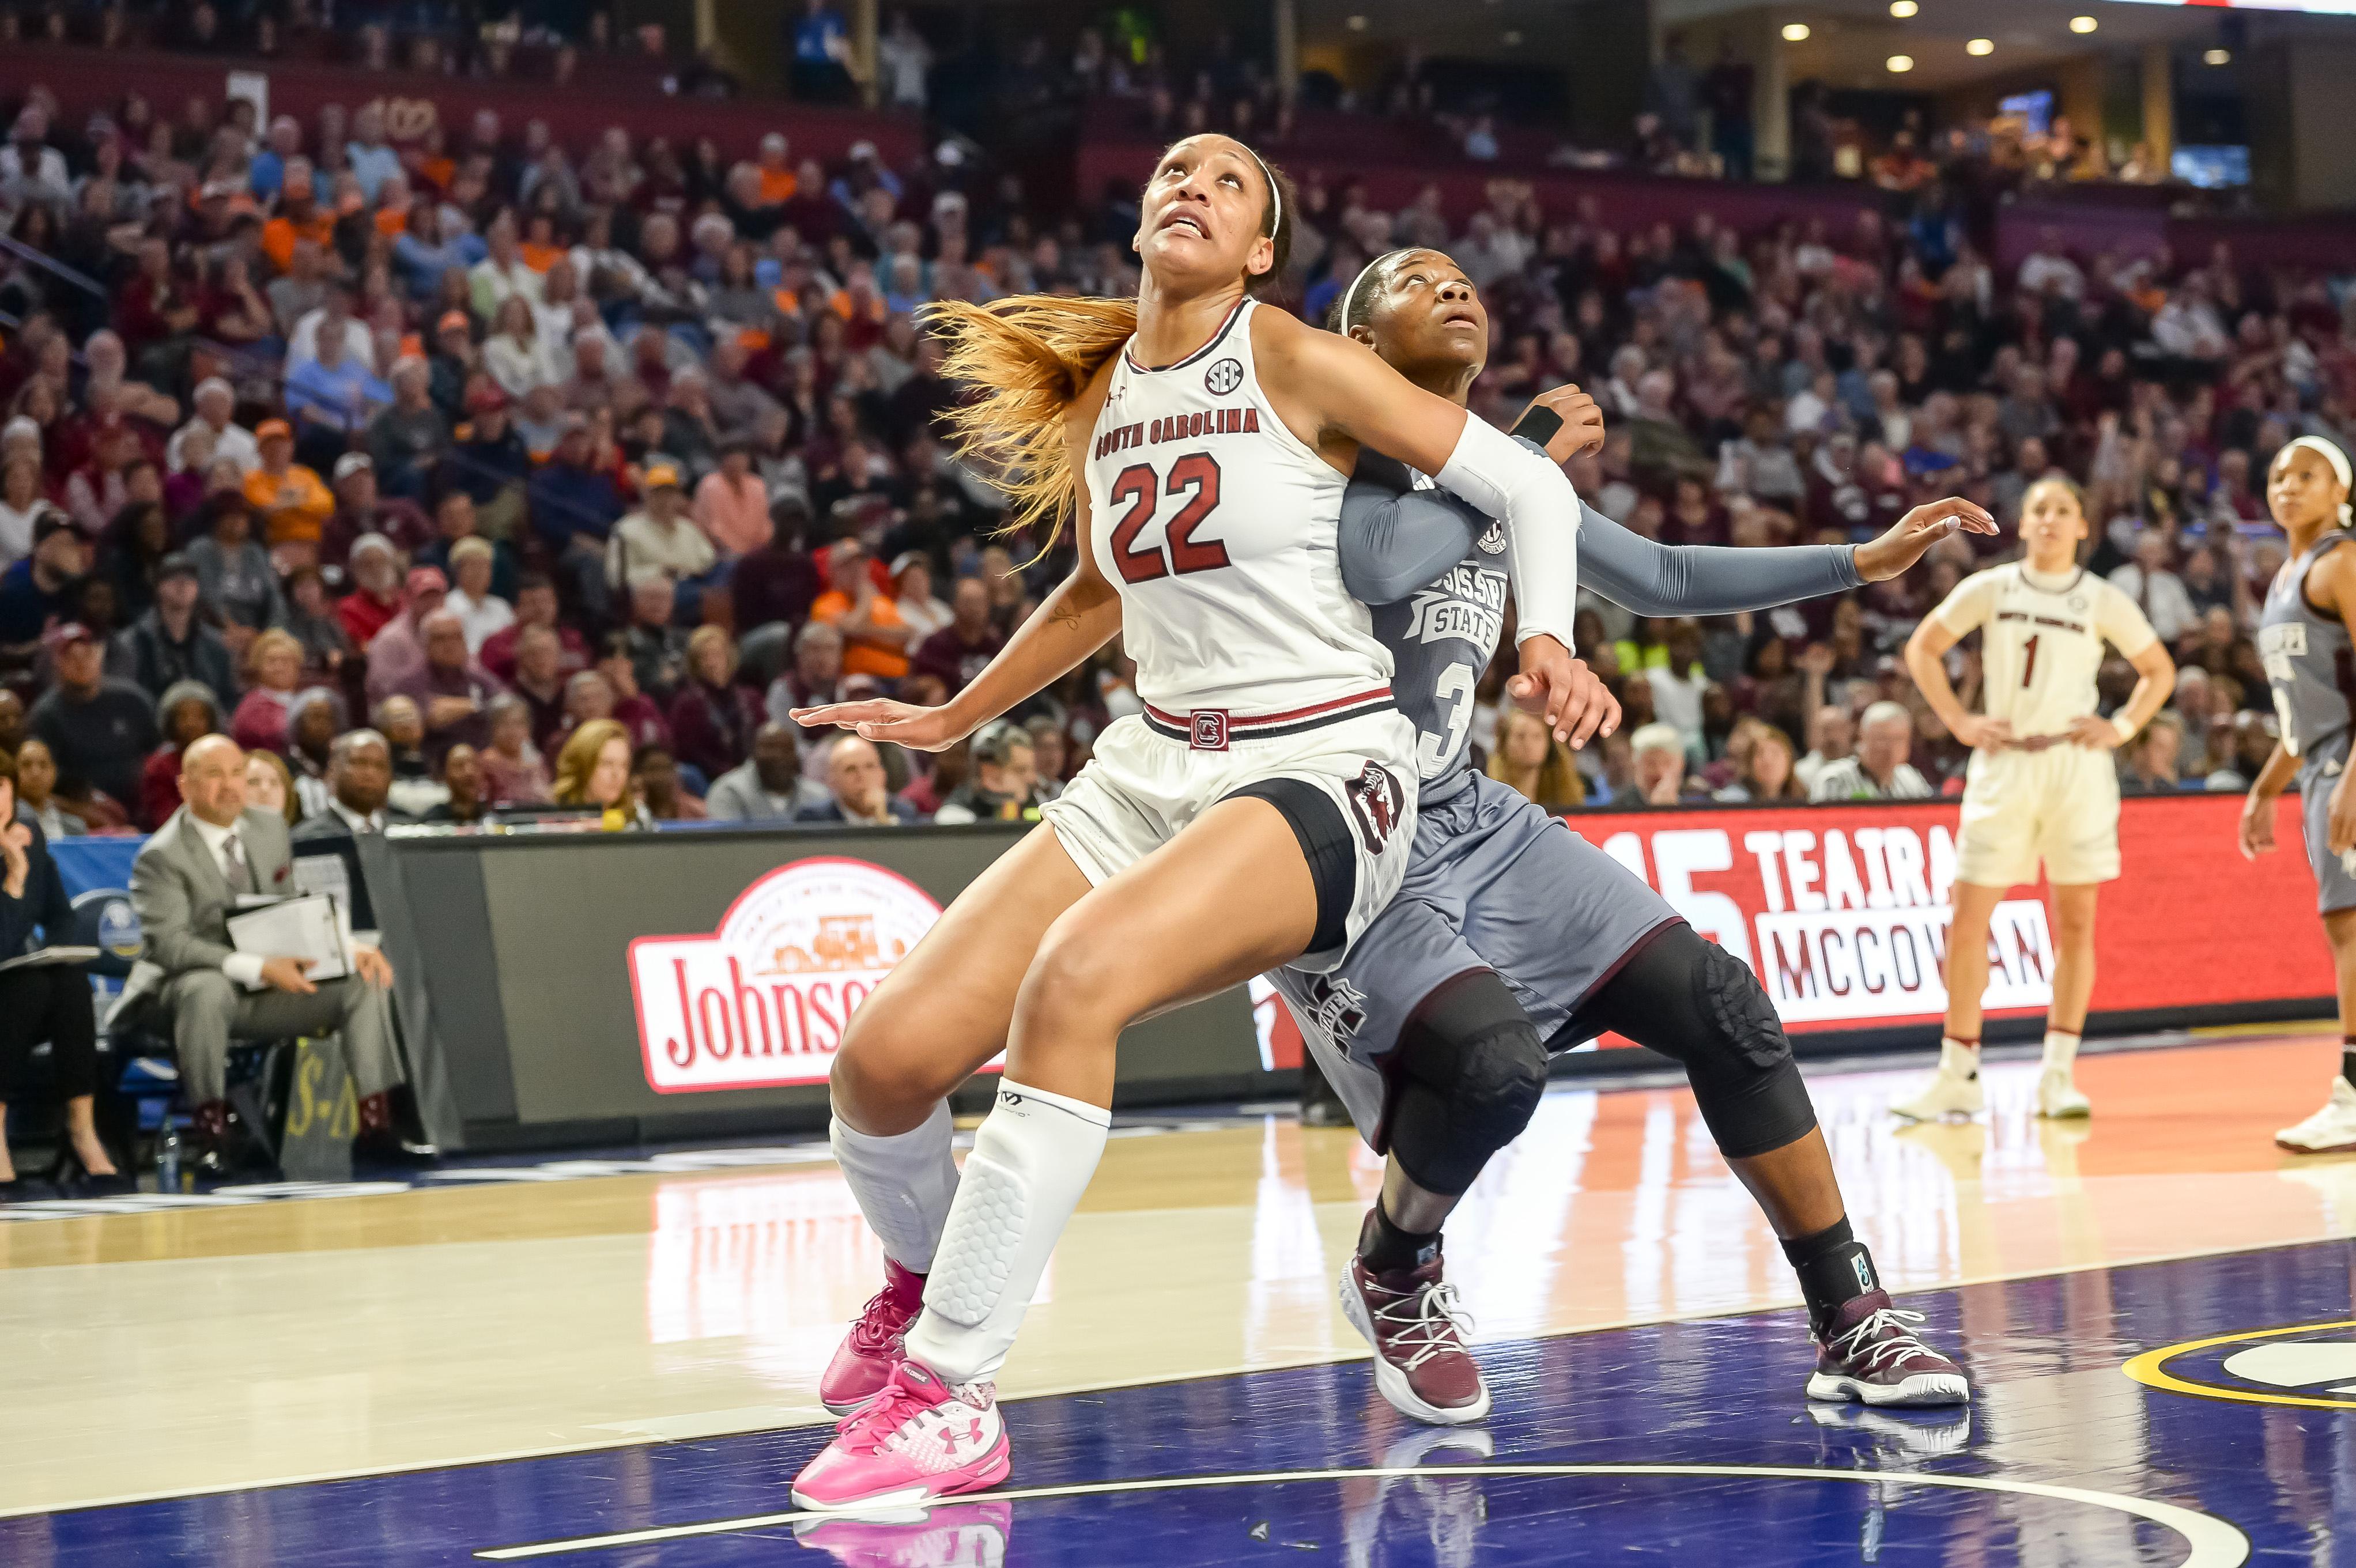 COLLEGE BASKETBALL: MAR 05 SEC Women's Tournament - South Carolina v Mississippi State